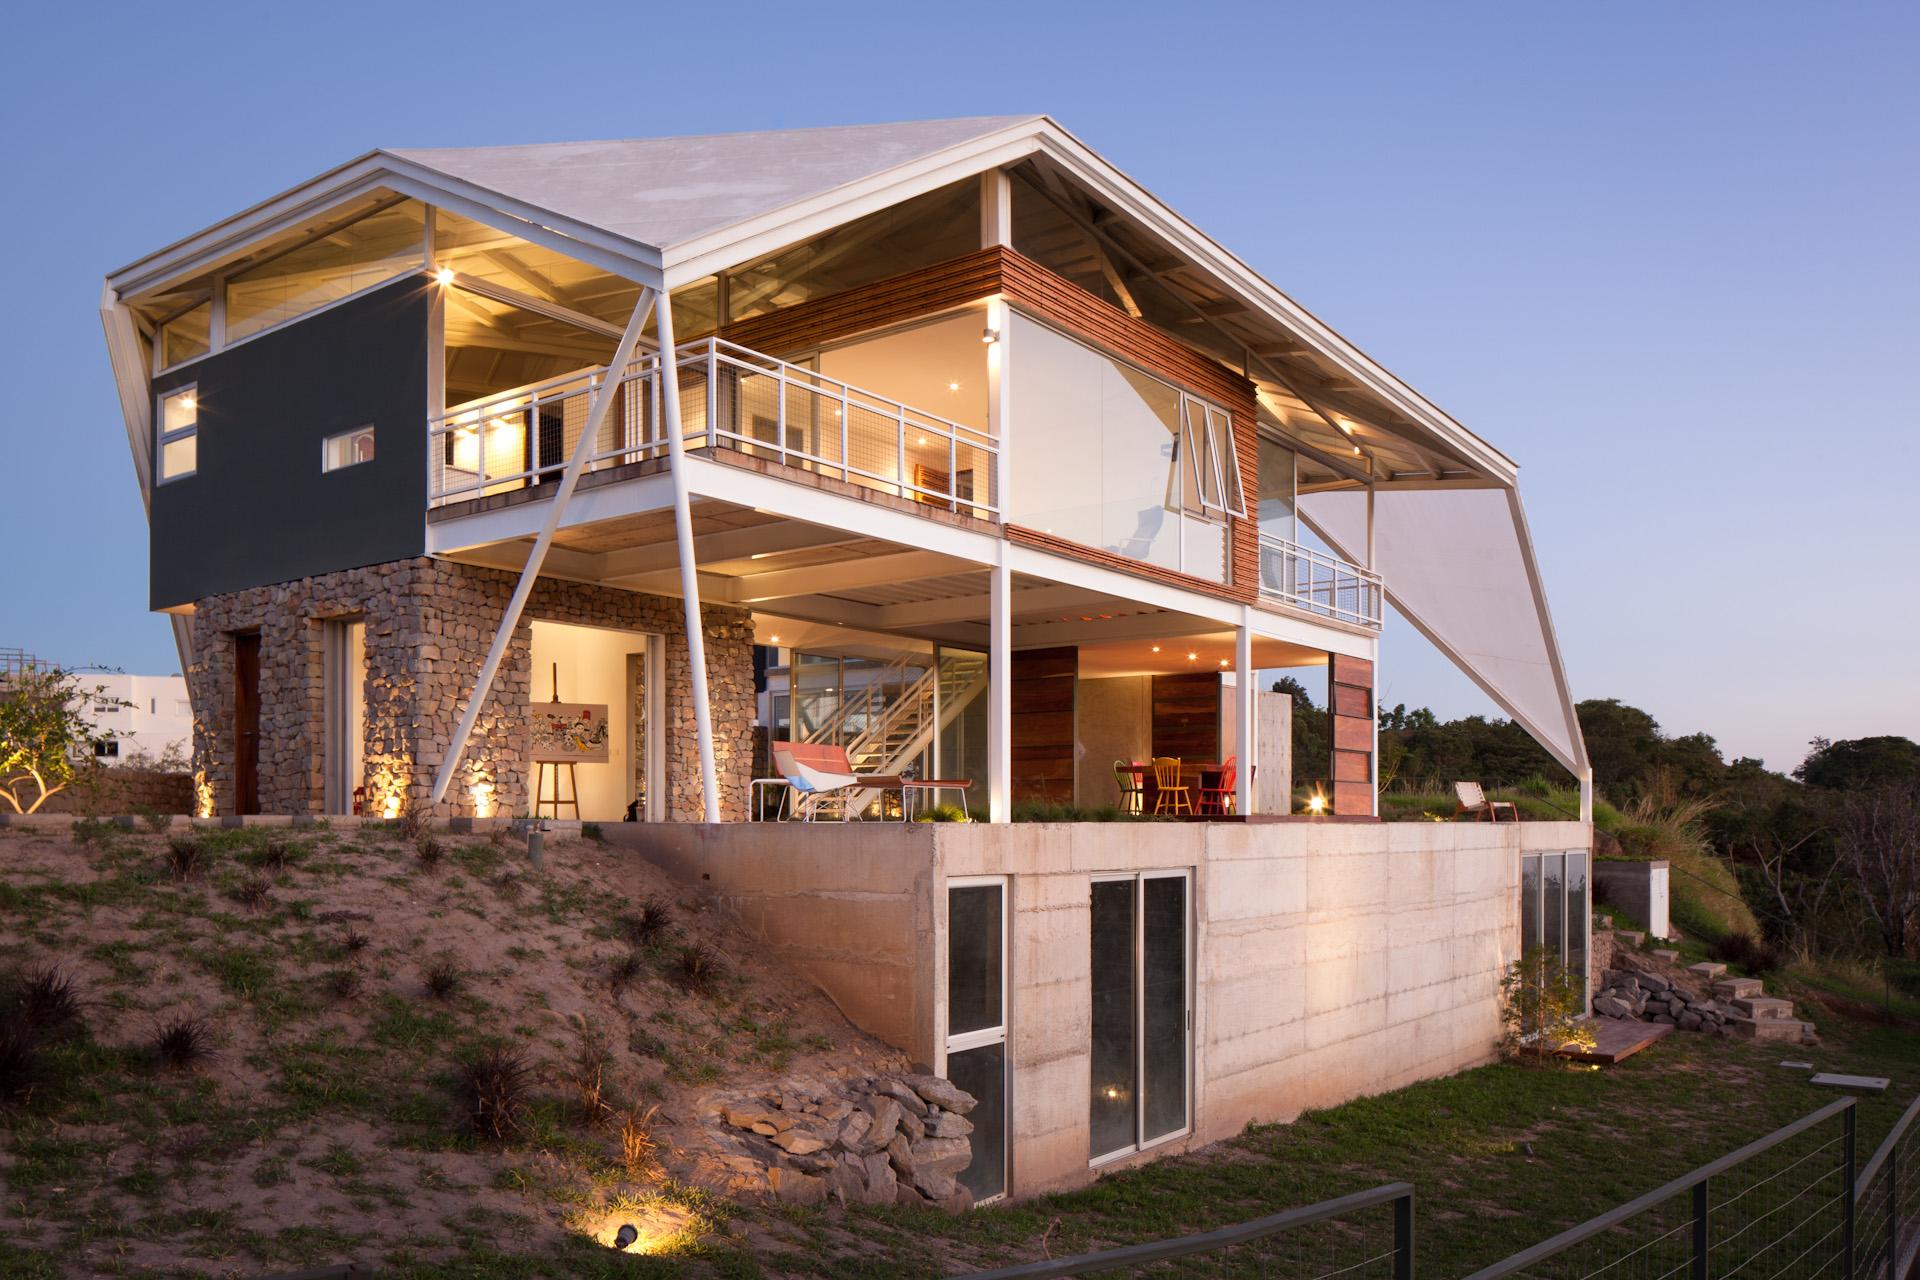 Architecture-Modern-La-Piscucha-El-Salvador-Jason-Bax-Dwell-04.JPG